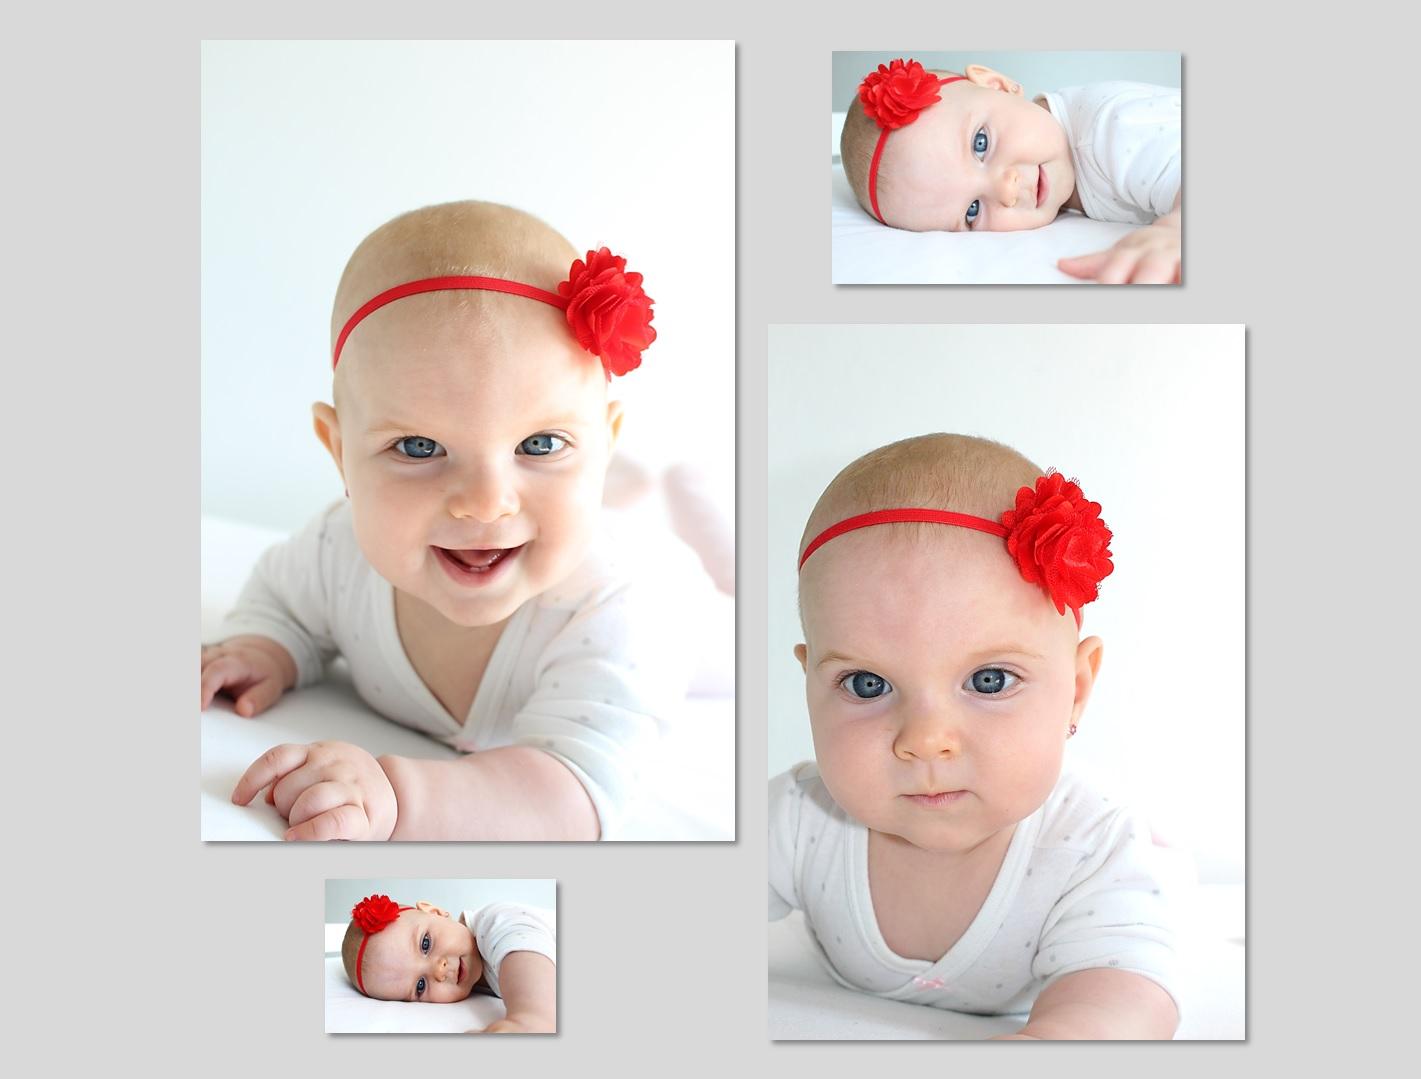 4fb991128d6 Čelenka pro miminko a holčičky - různé barvy